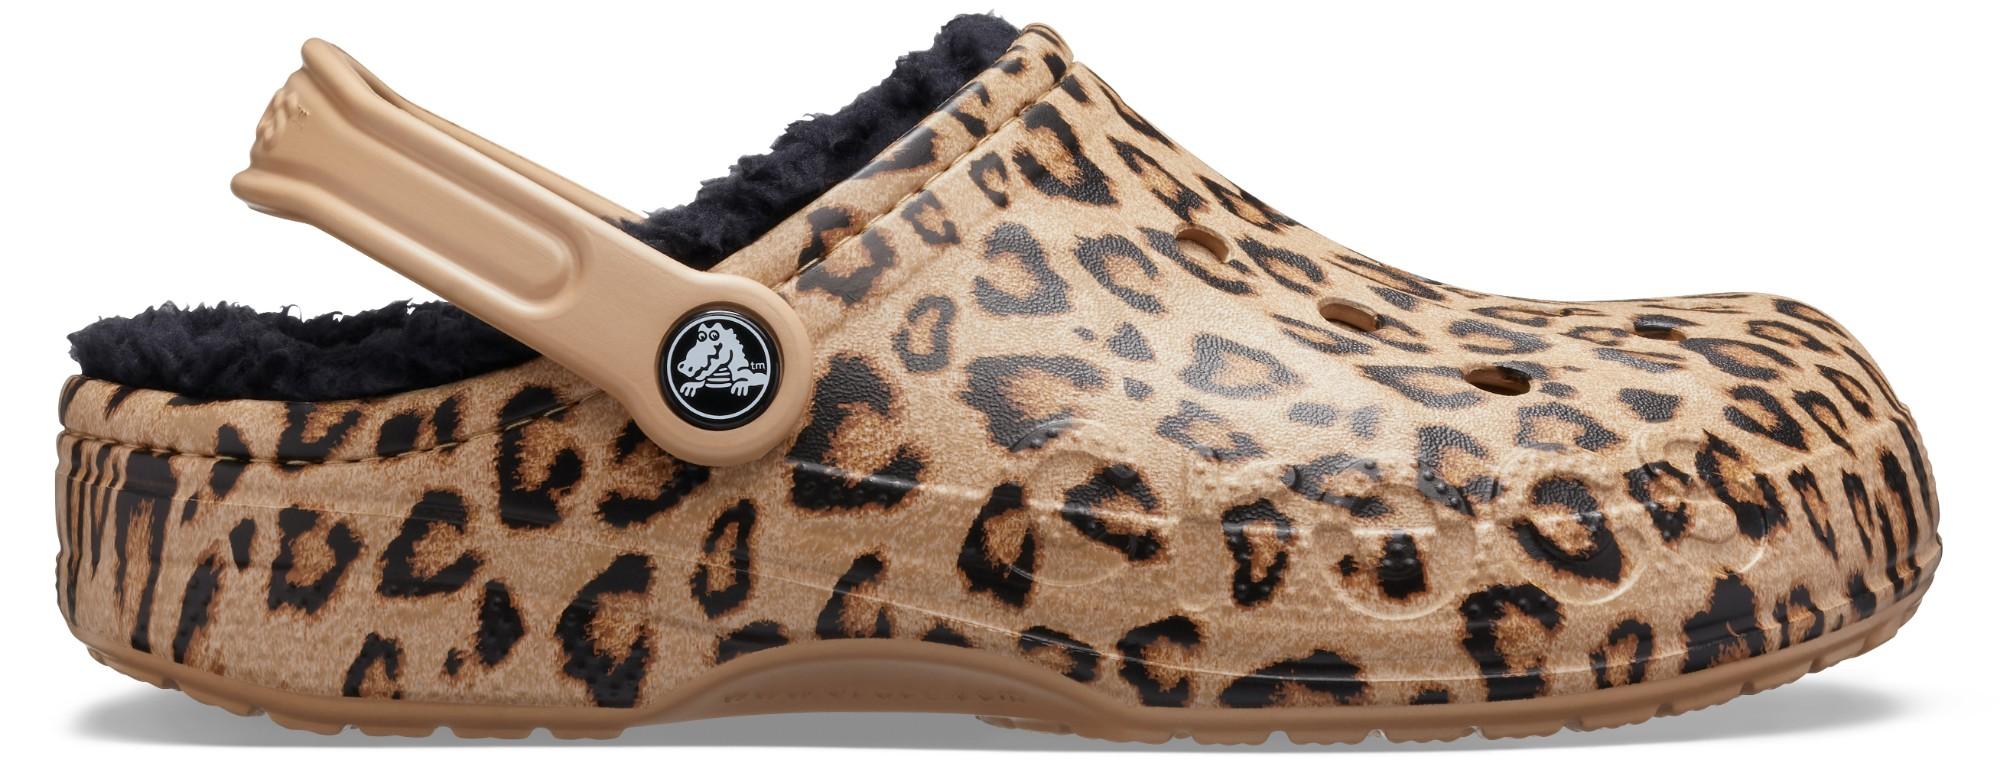 Crocs™ Baya Lined Printed Clog Leopard/Gold 37,5